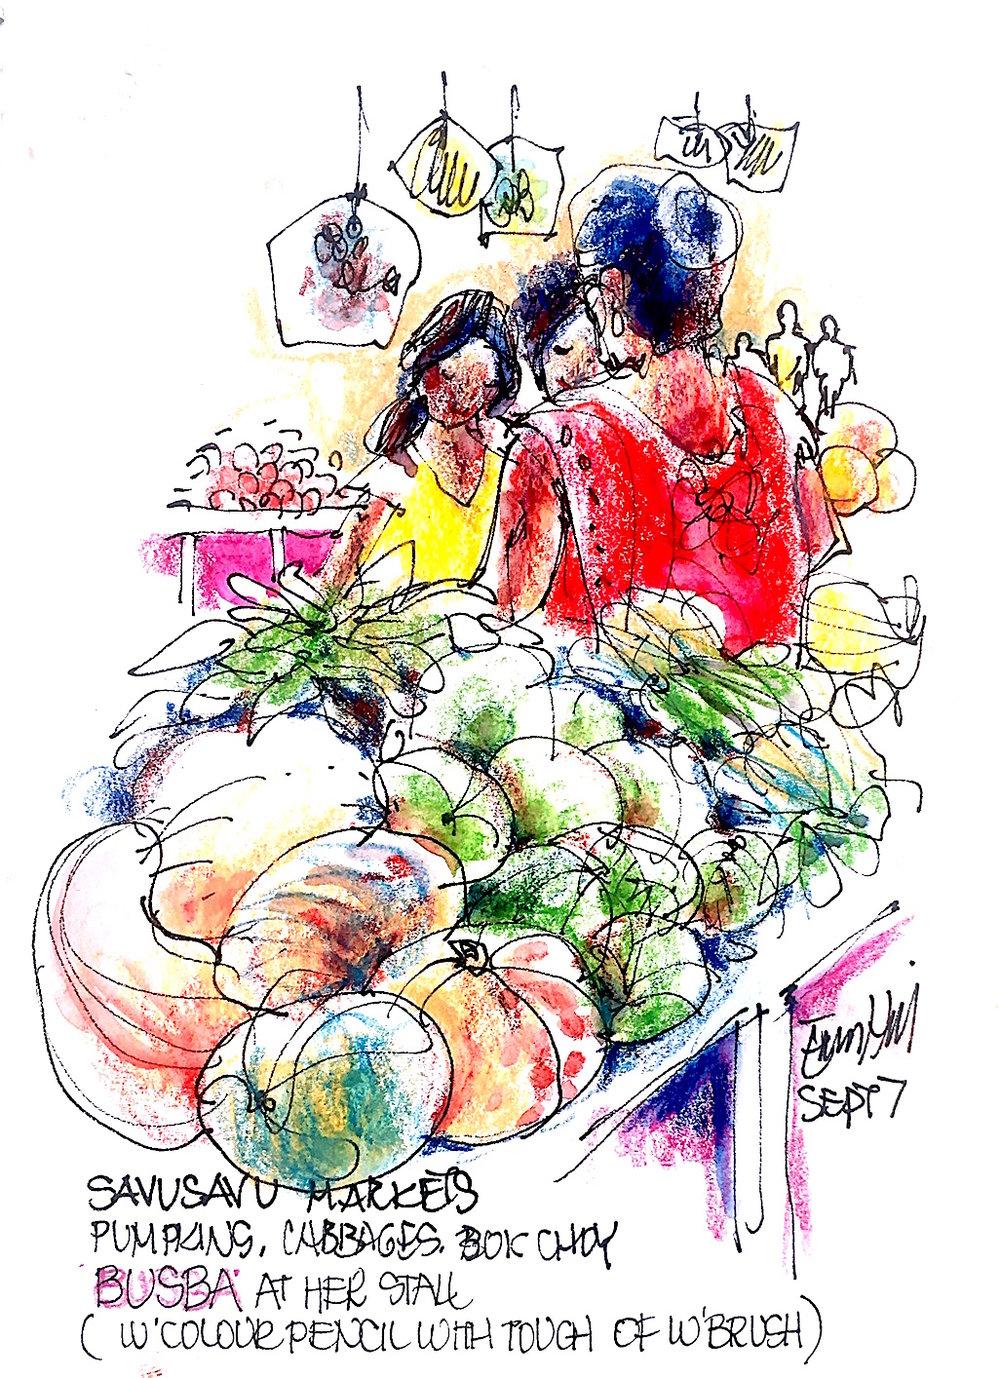 Erin Hill Savusavu Markets.jpg